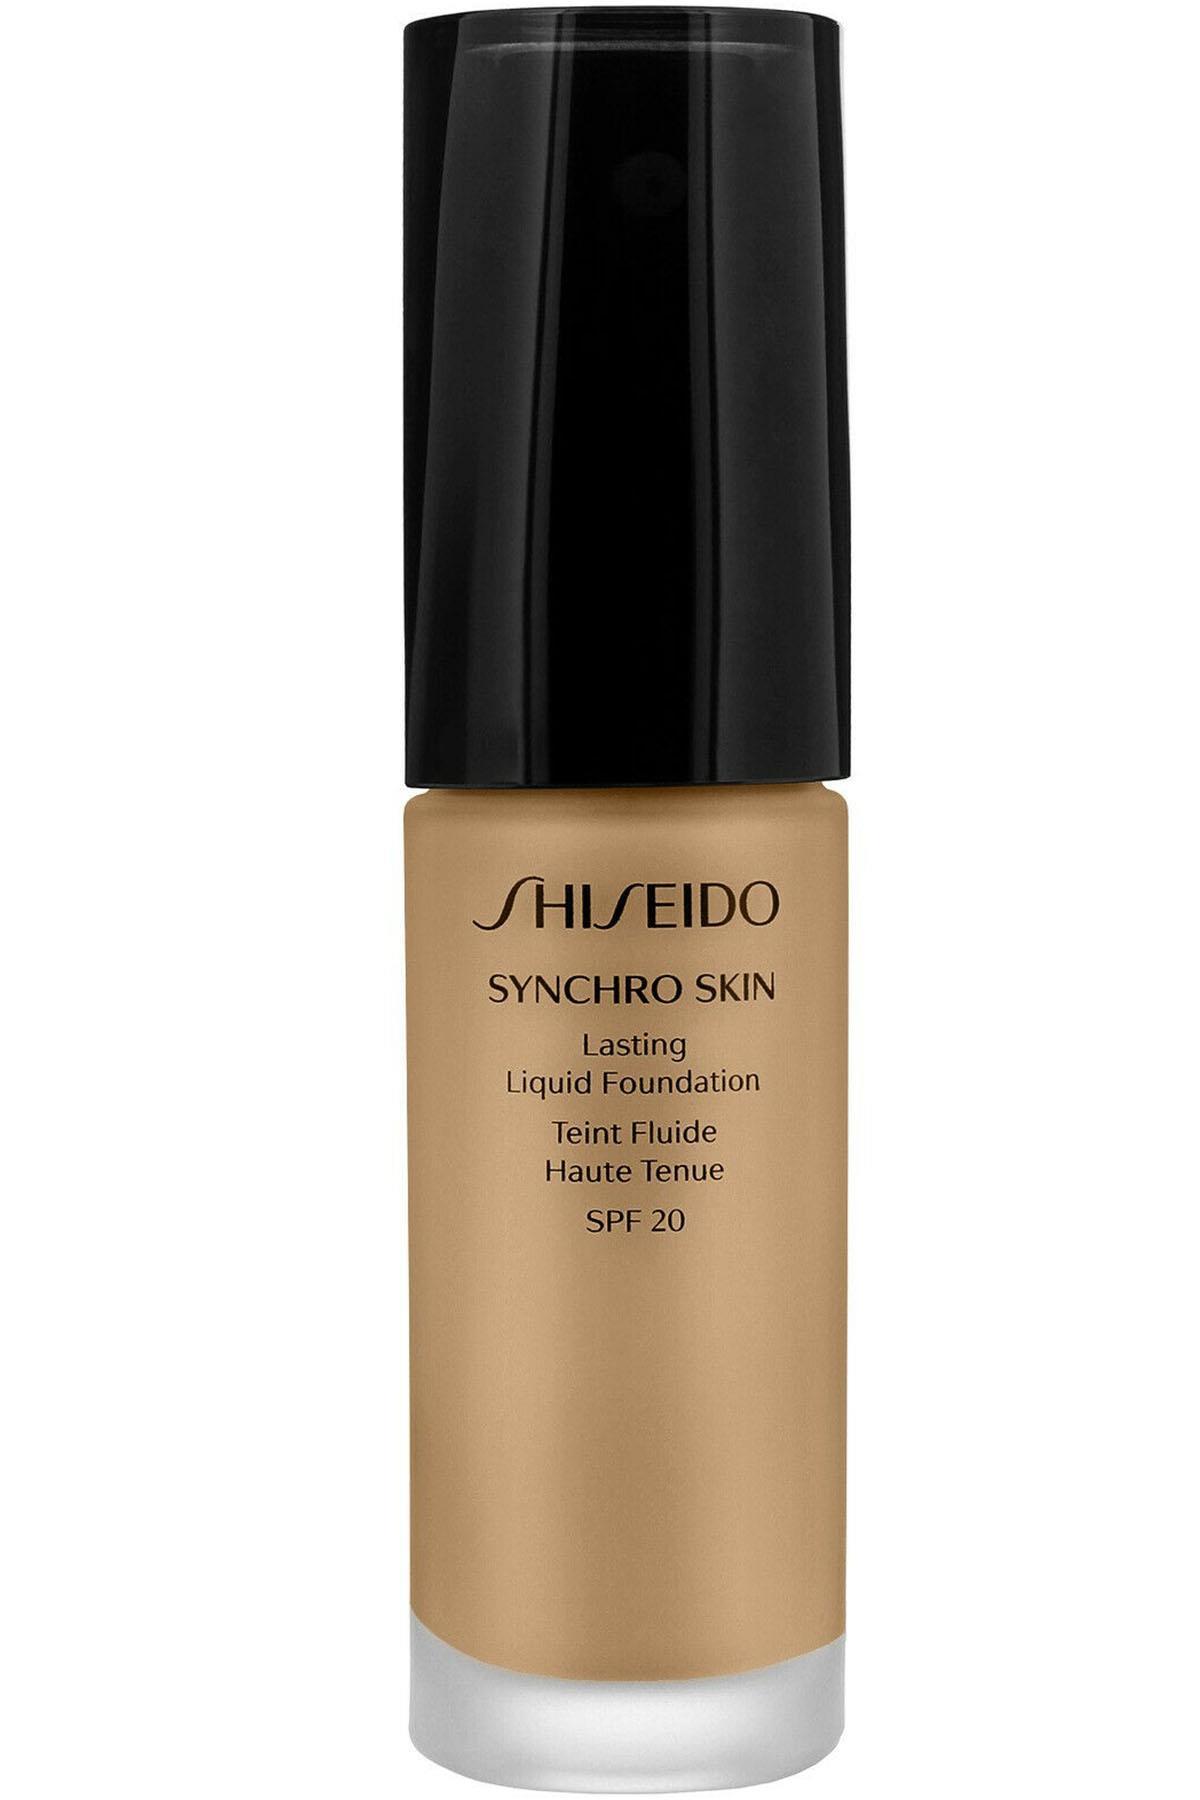 Shiseido Synchro Skin Lasting Fondöten SPF20 30 ml